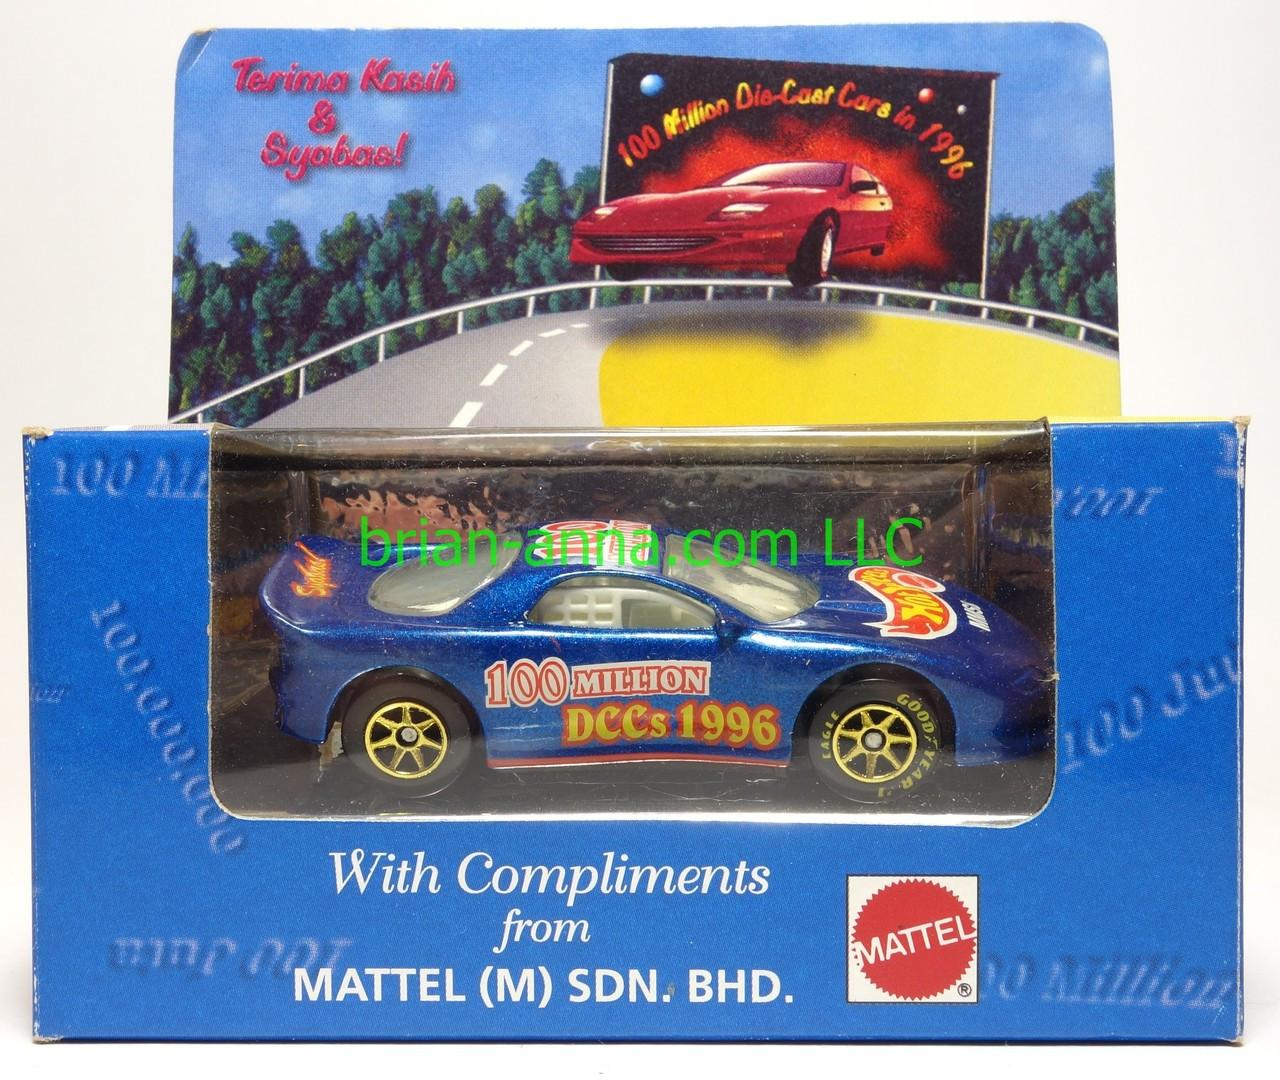 Hot Wheels Mattel Employee 1993 Camaro, Malaysia 100 Million Die Cast Cars in 1996